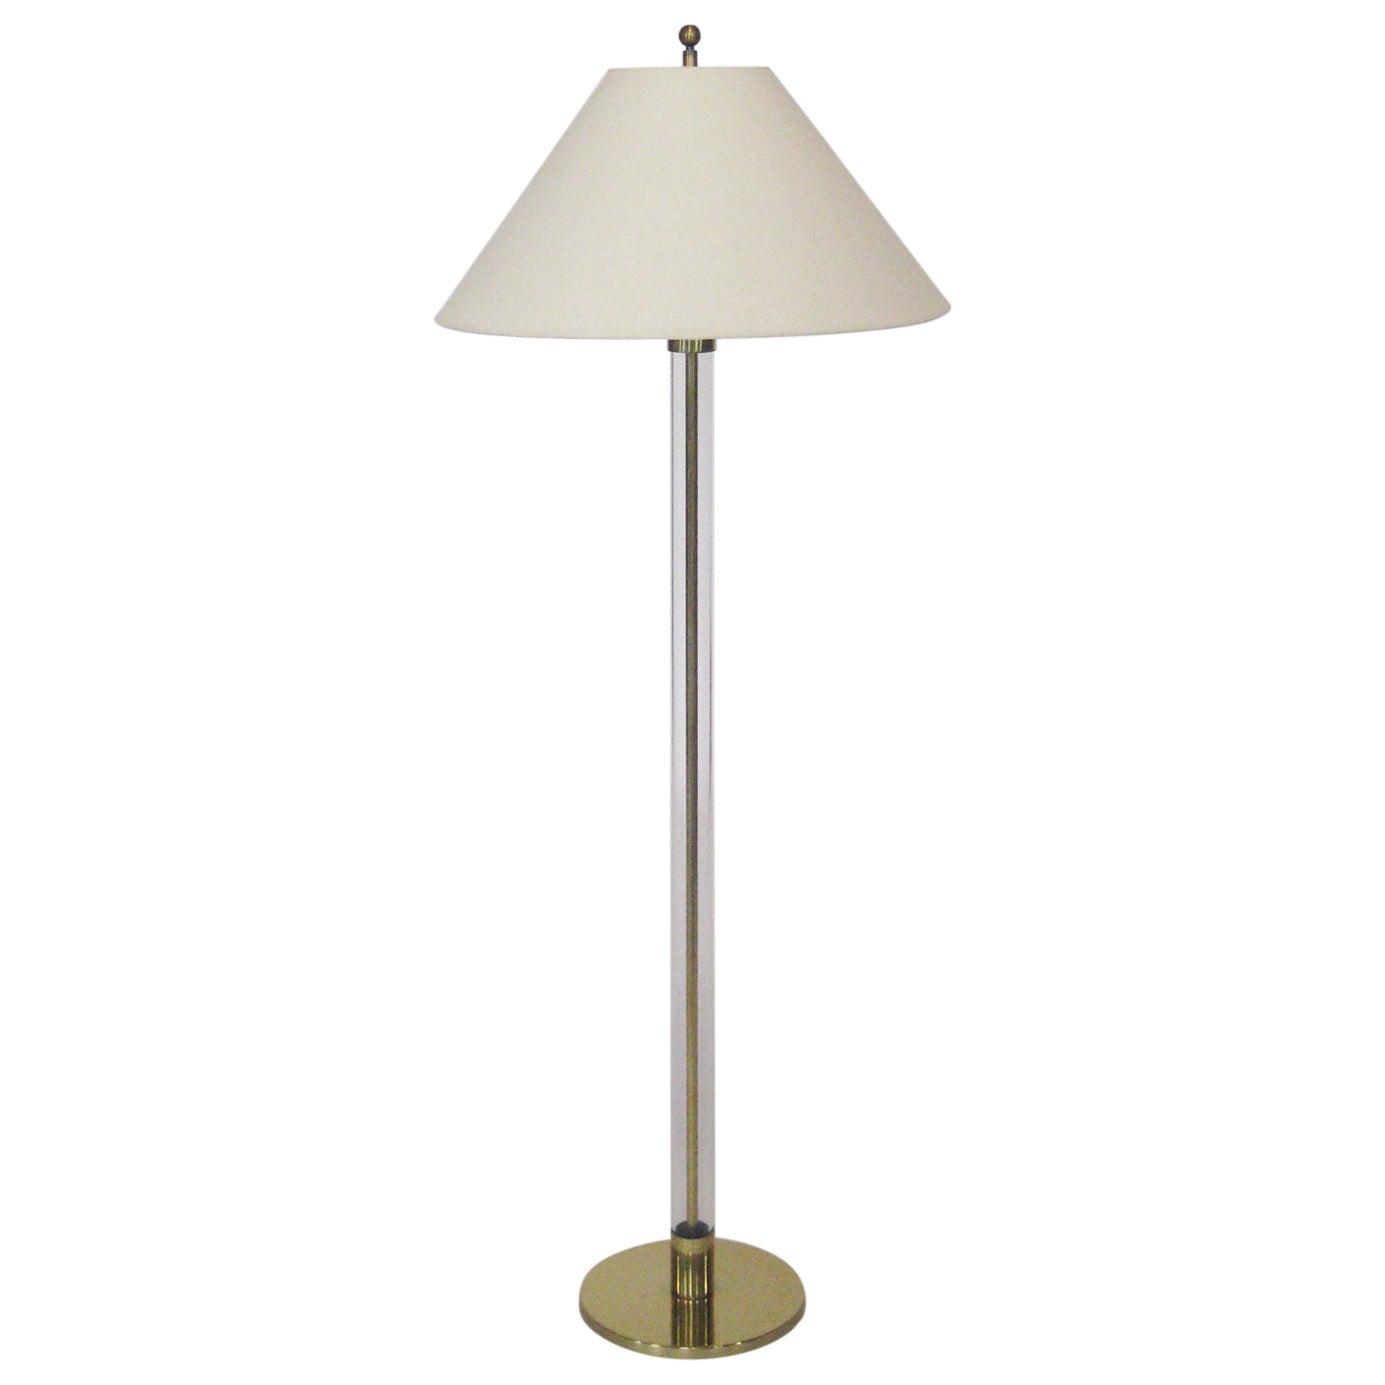 Tubular Glass Floor Lamp by Laurel